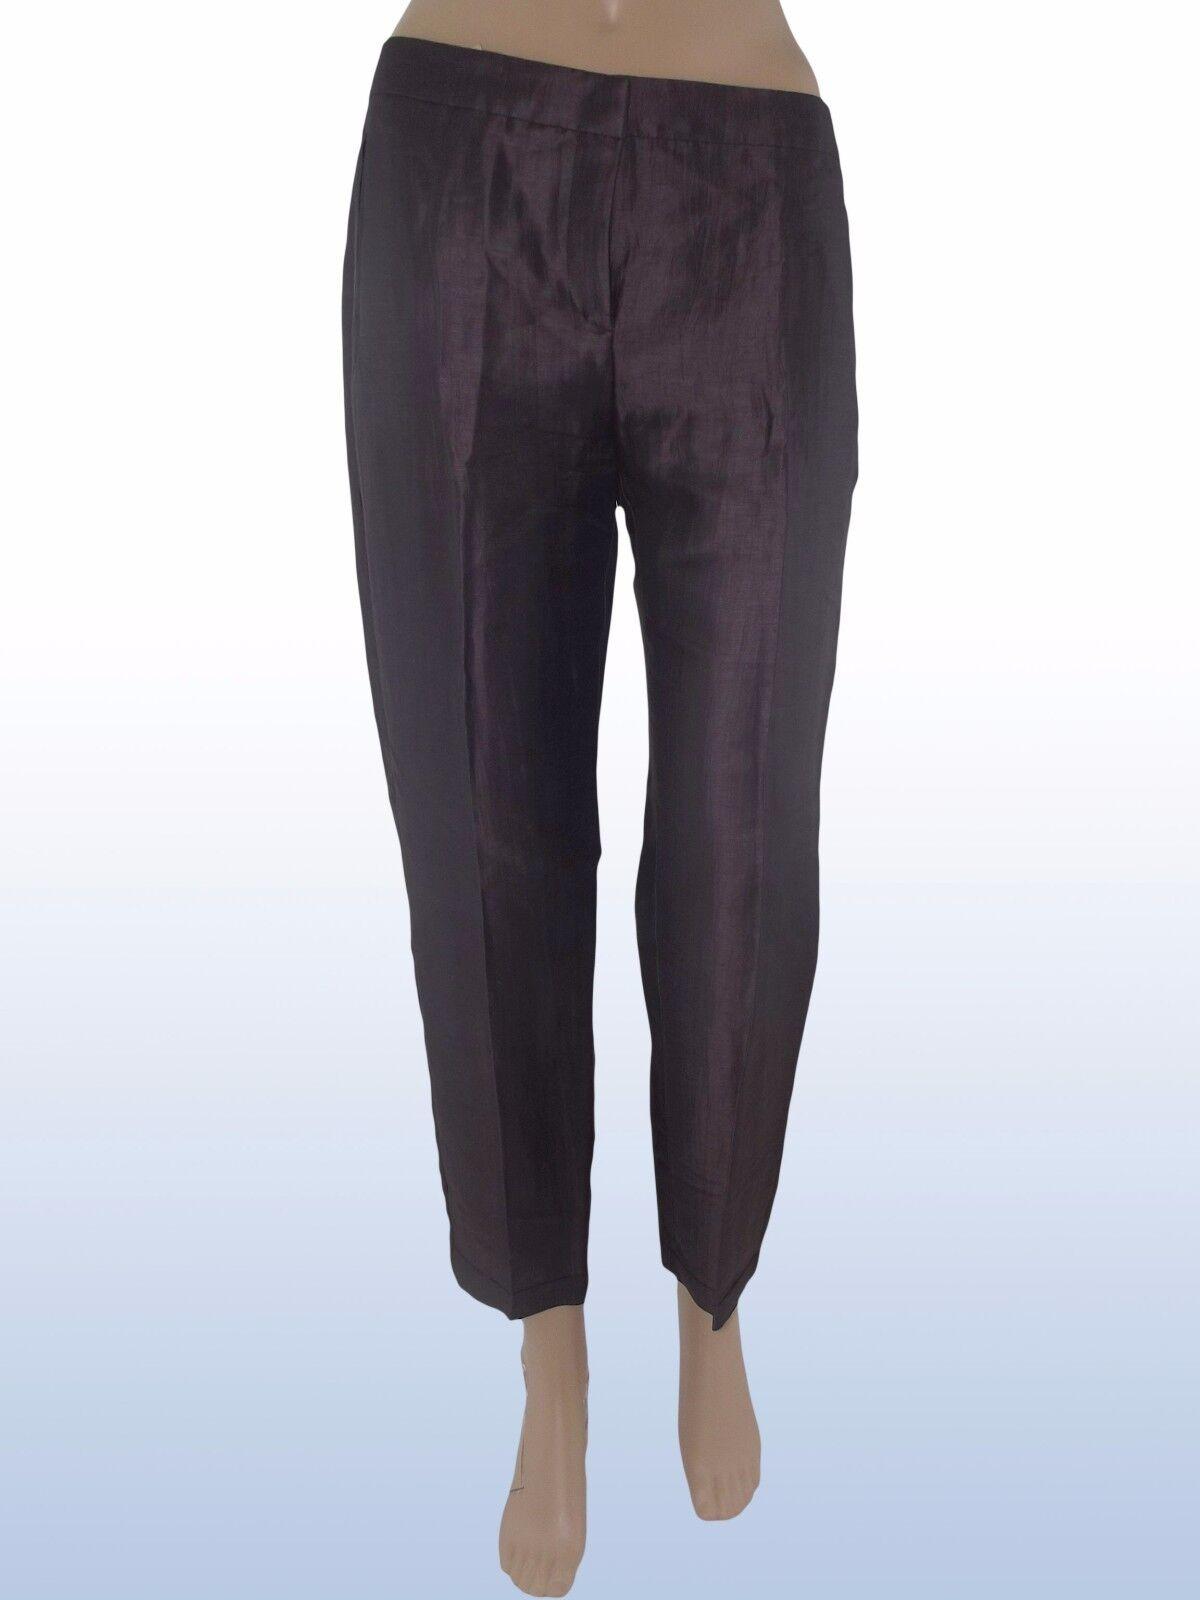 Pantalone donna grigio lino lino lino seta I bluS MAX MARA it 42 uk 10 de 36 w 28 072f27